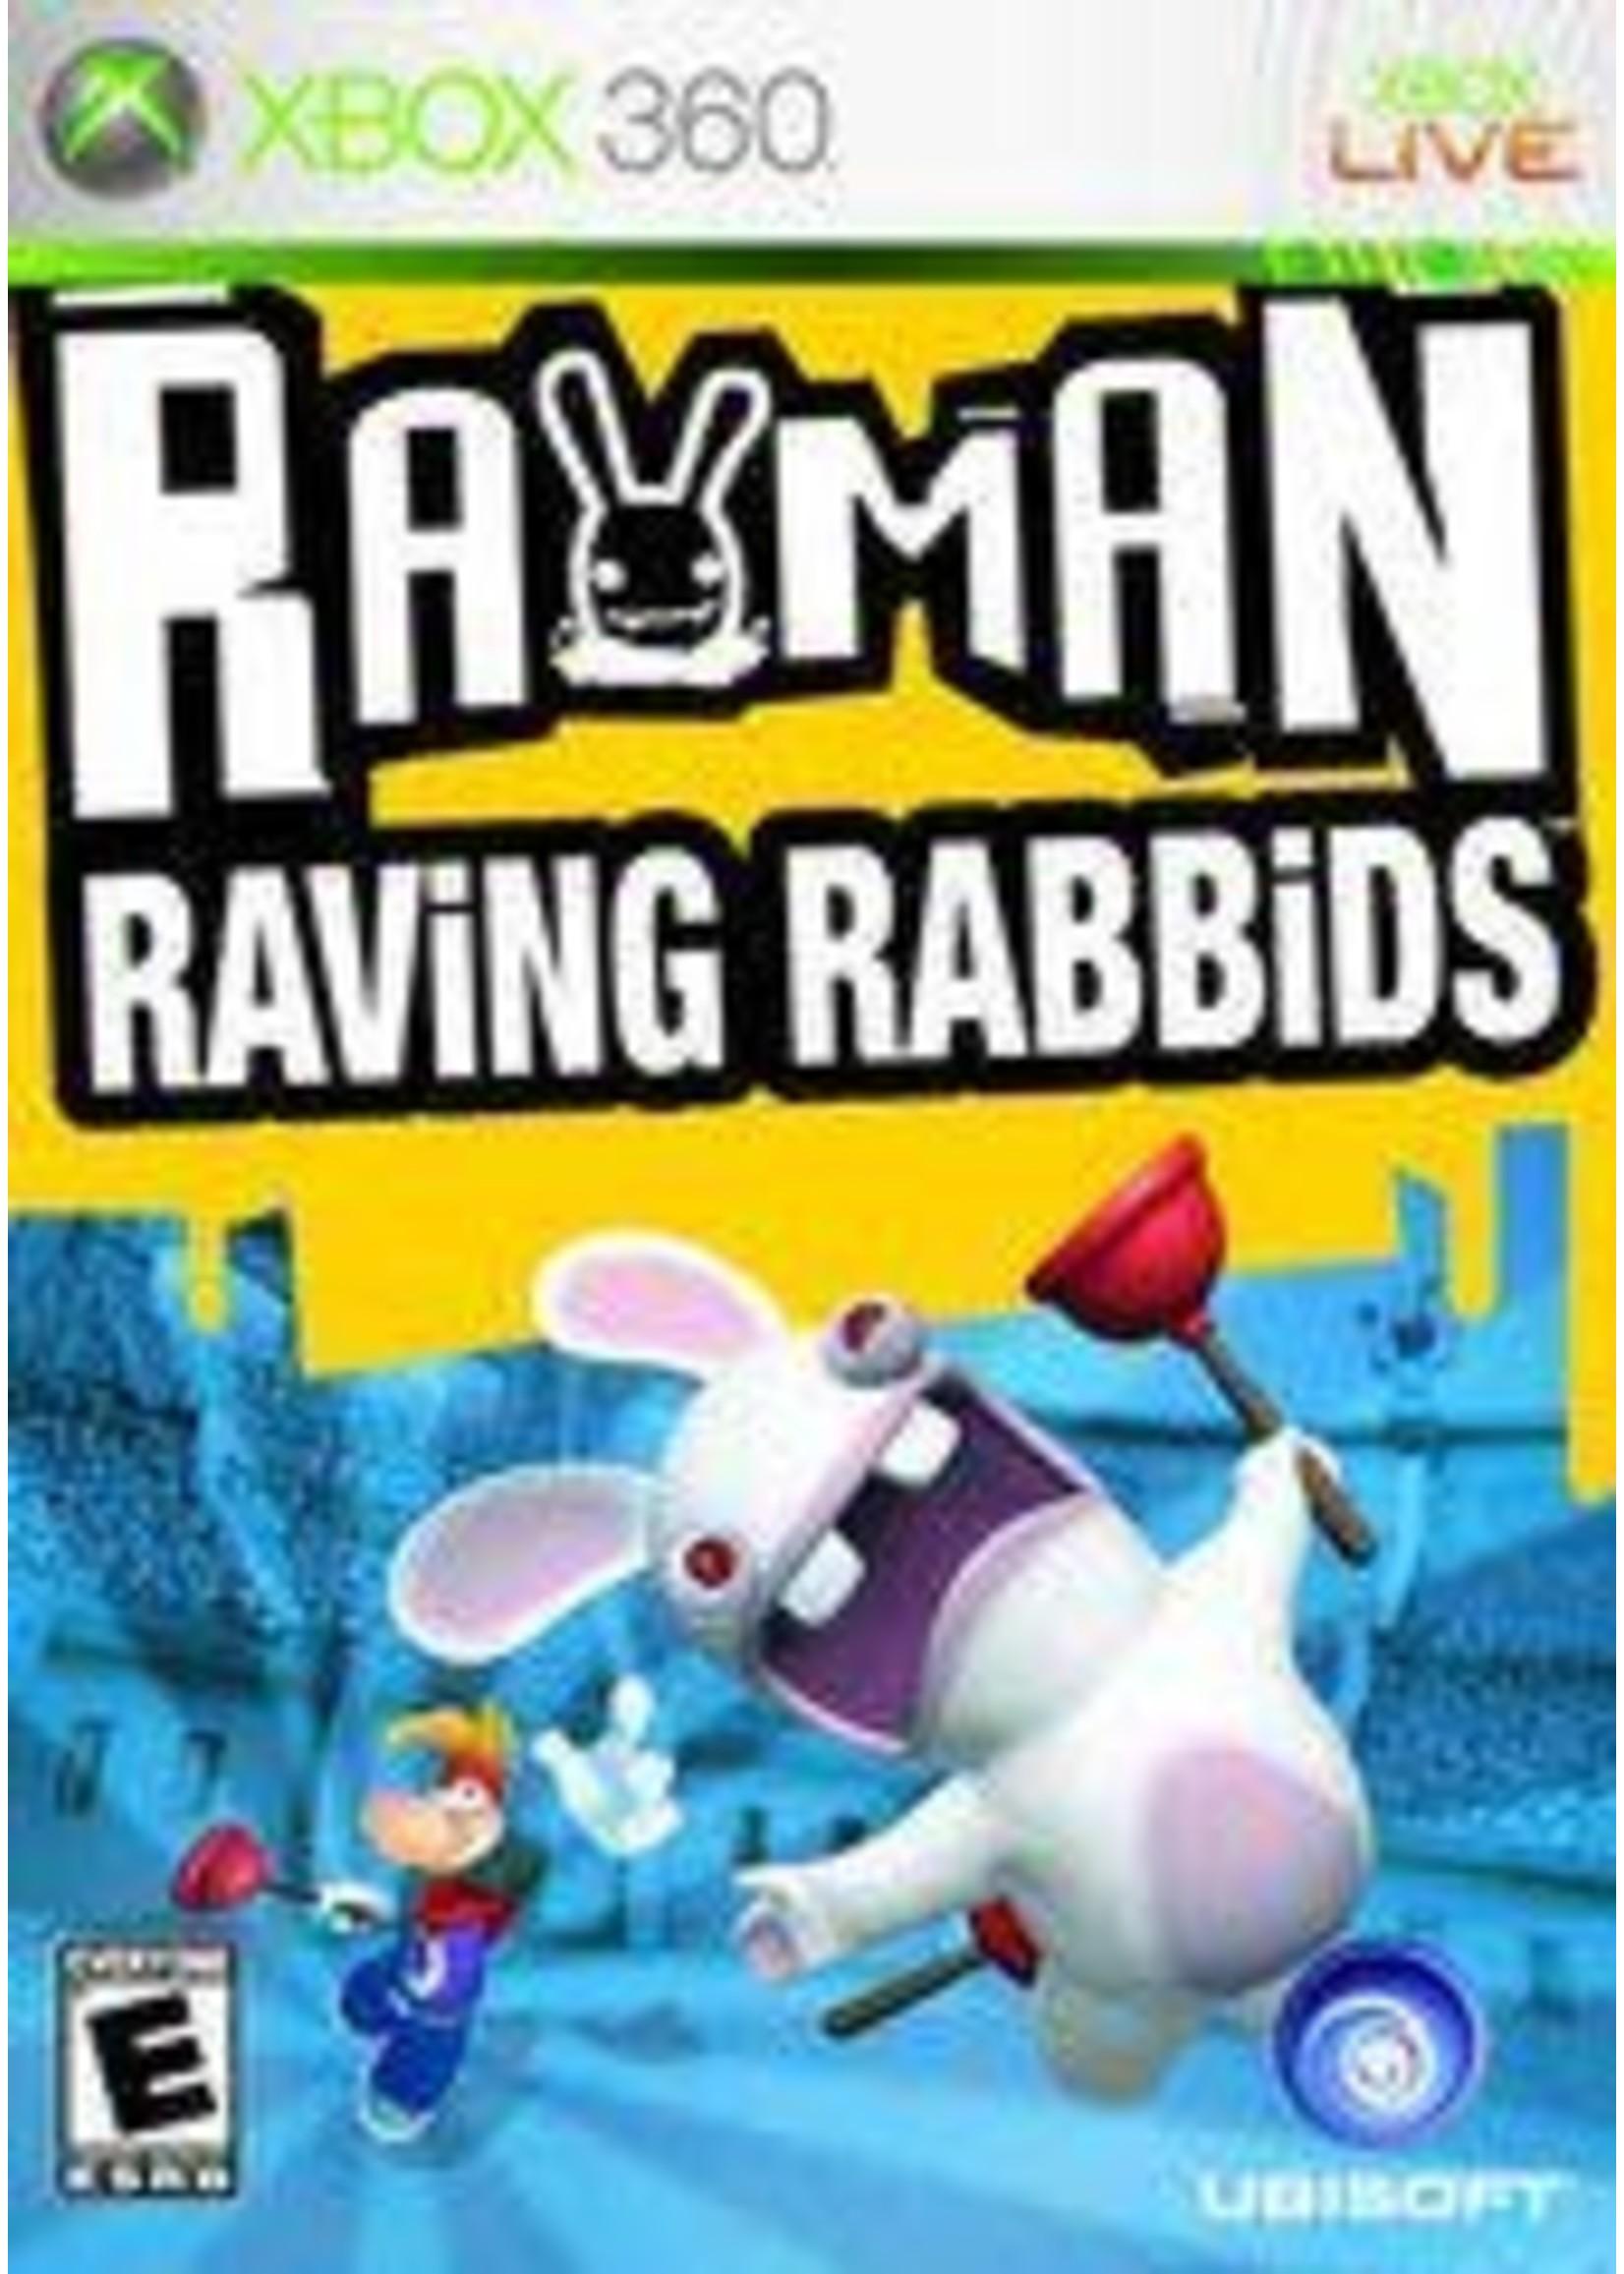 Rayman Raving Rabbids Xbox 360